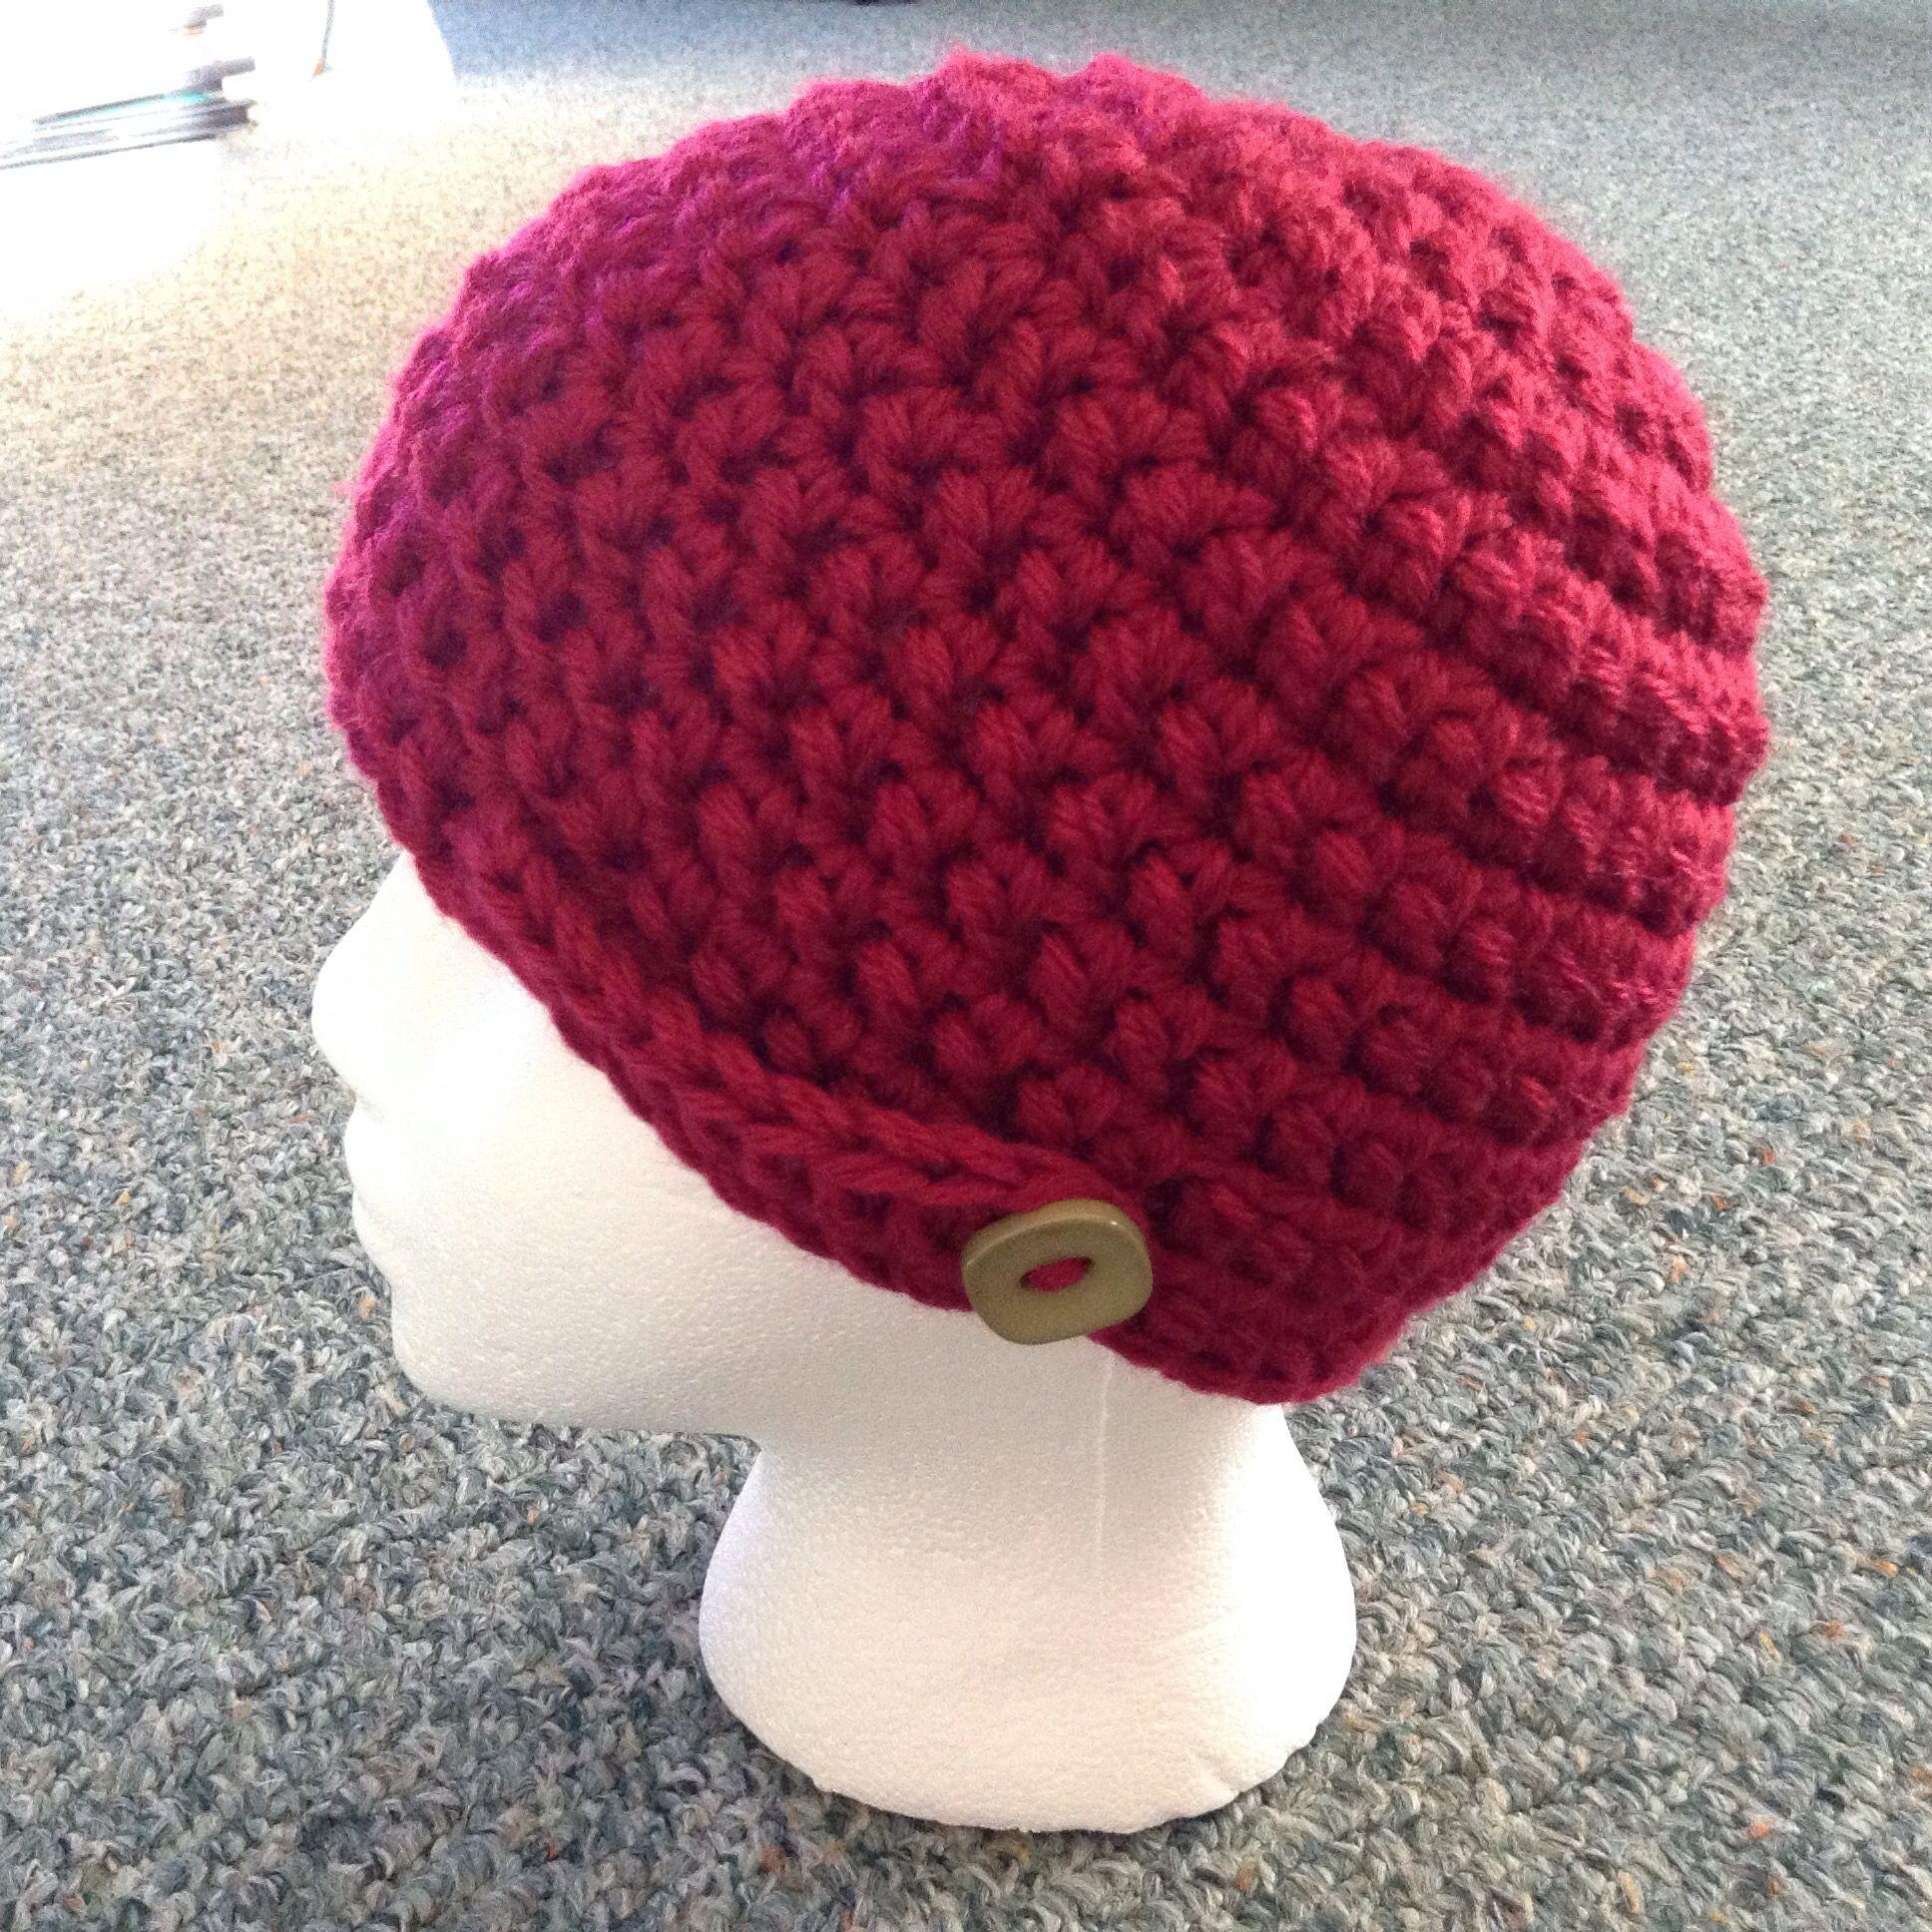 crochet hat - Free pattern at NicolaKnits.com | Crochet | Pinterest